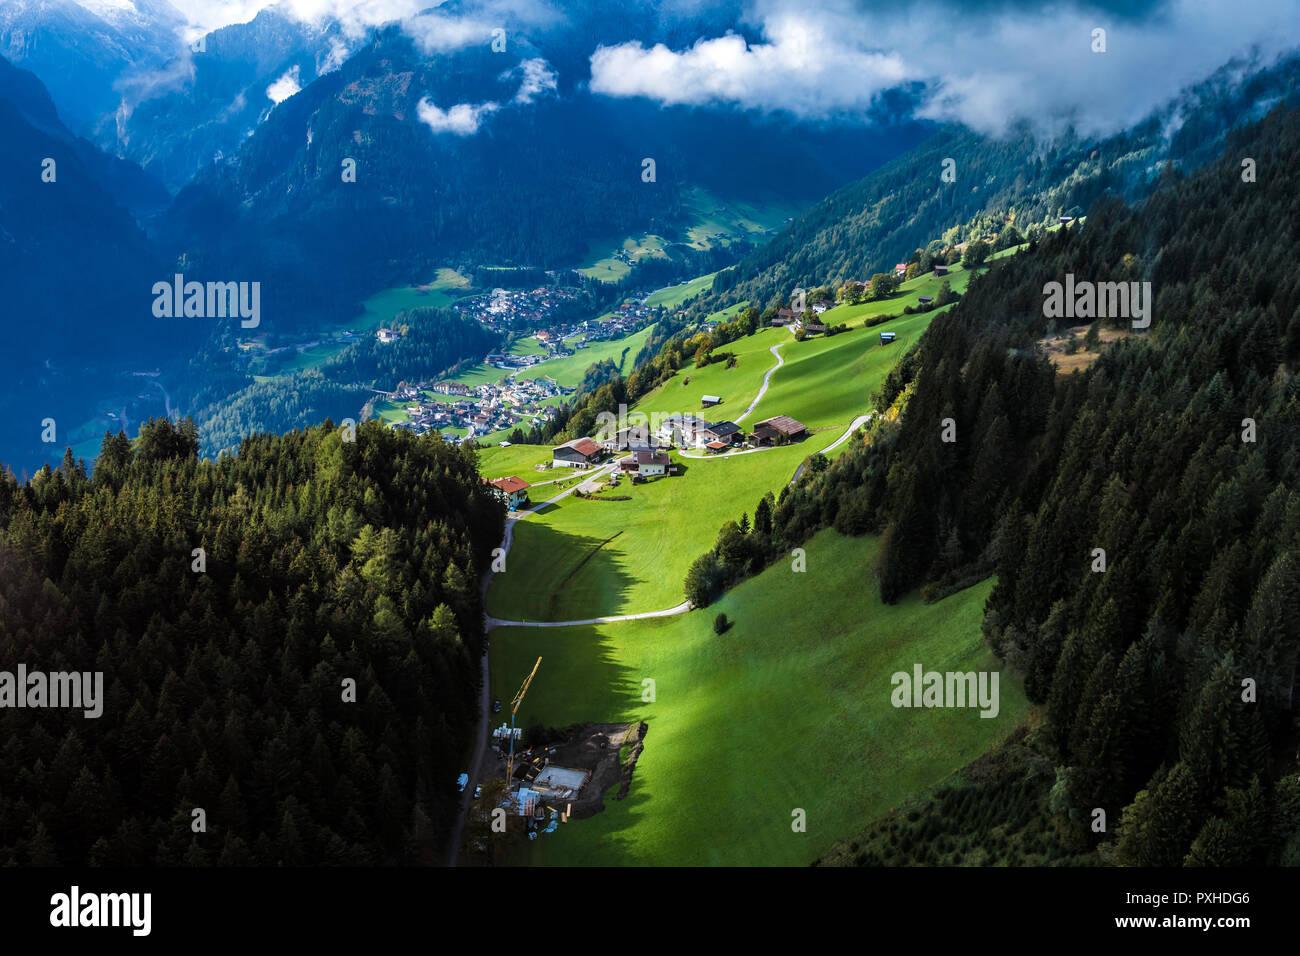 Ski resort in Mayrhofen, Austria - Stock Image